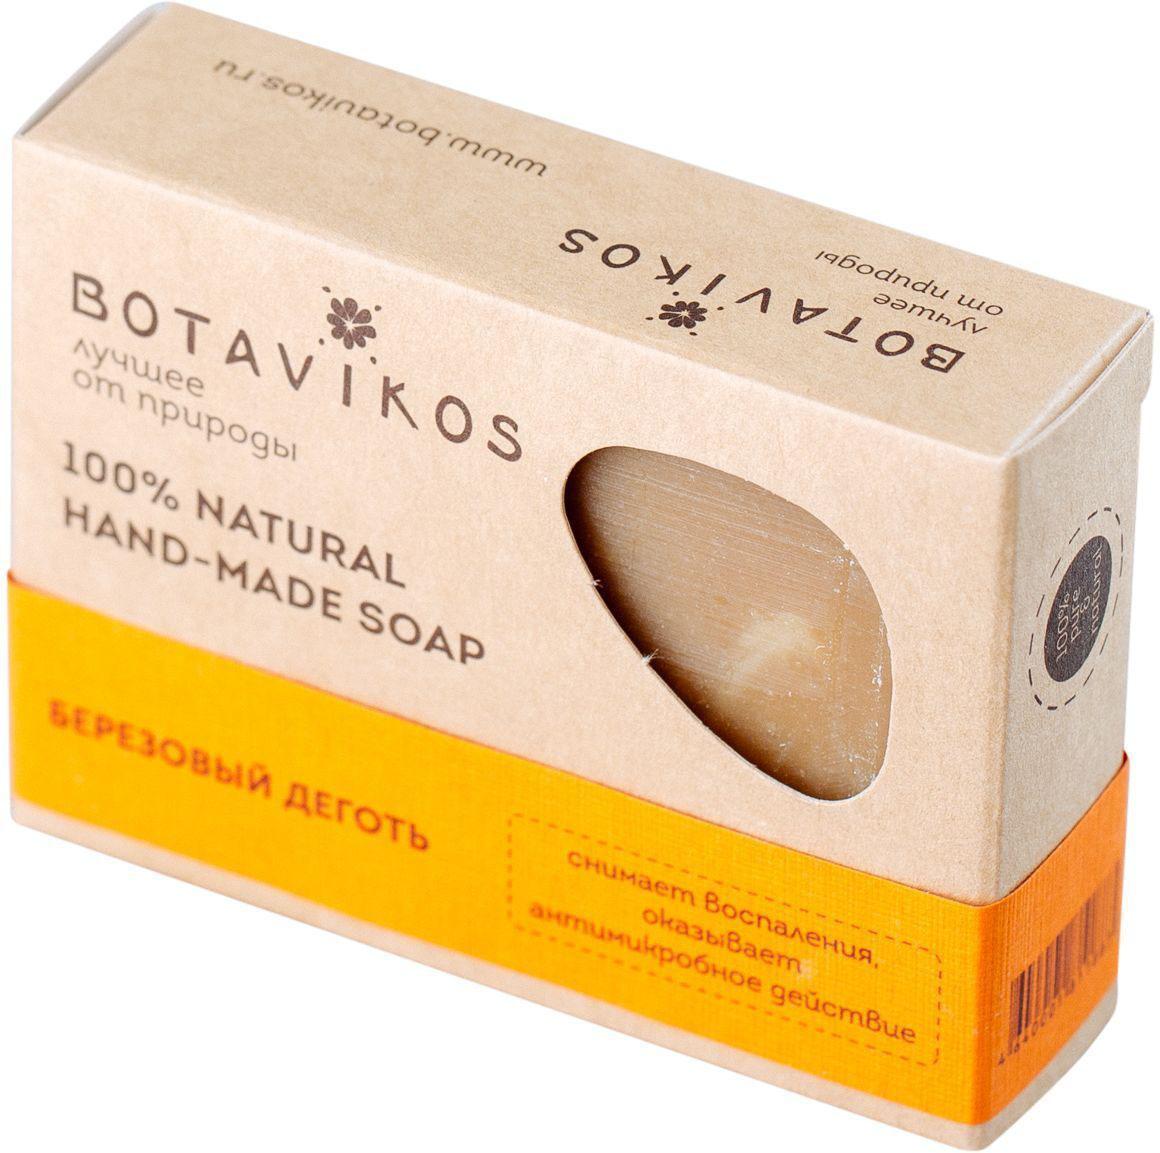 Botavikos мыло Березовый деготь деготь березовый 40мл